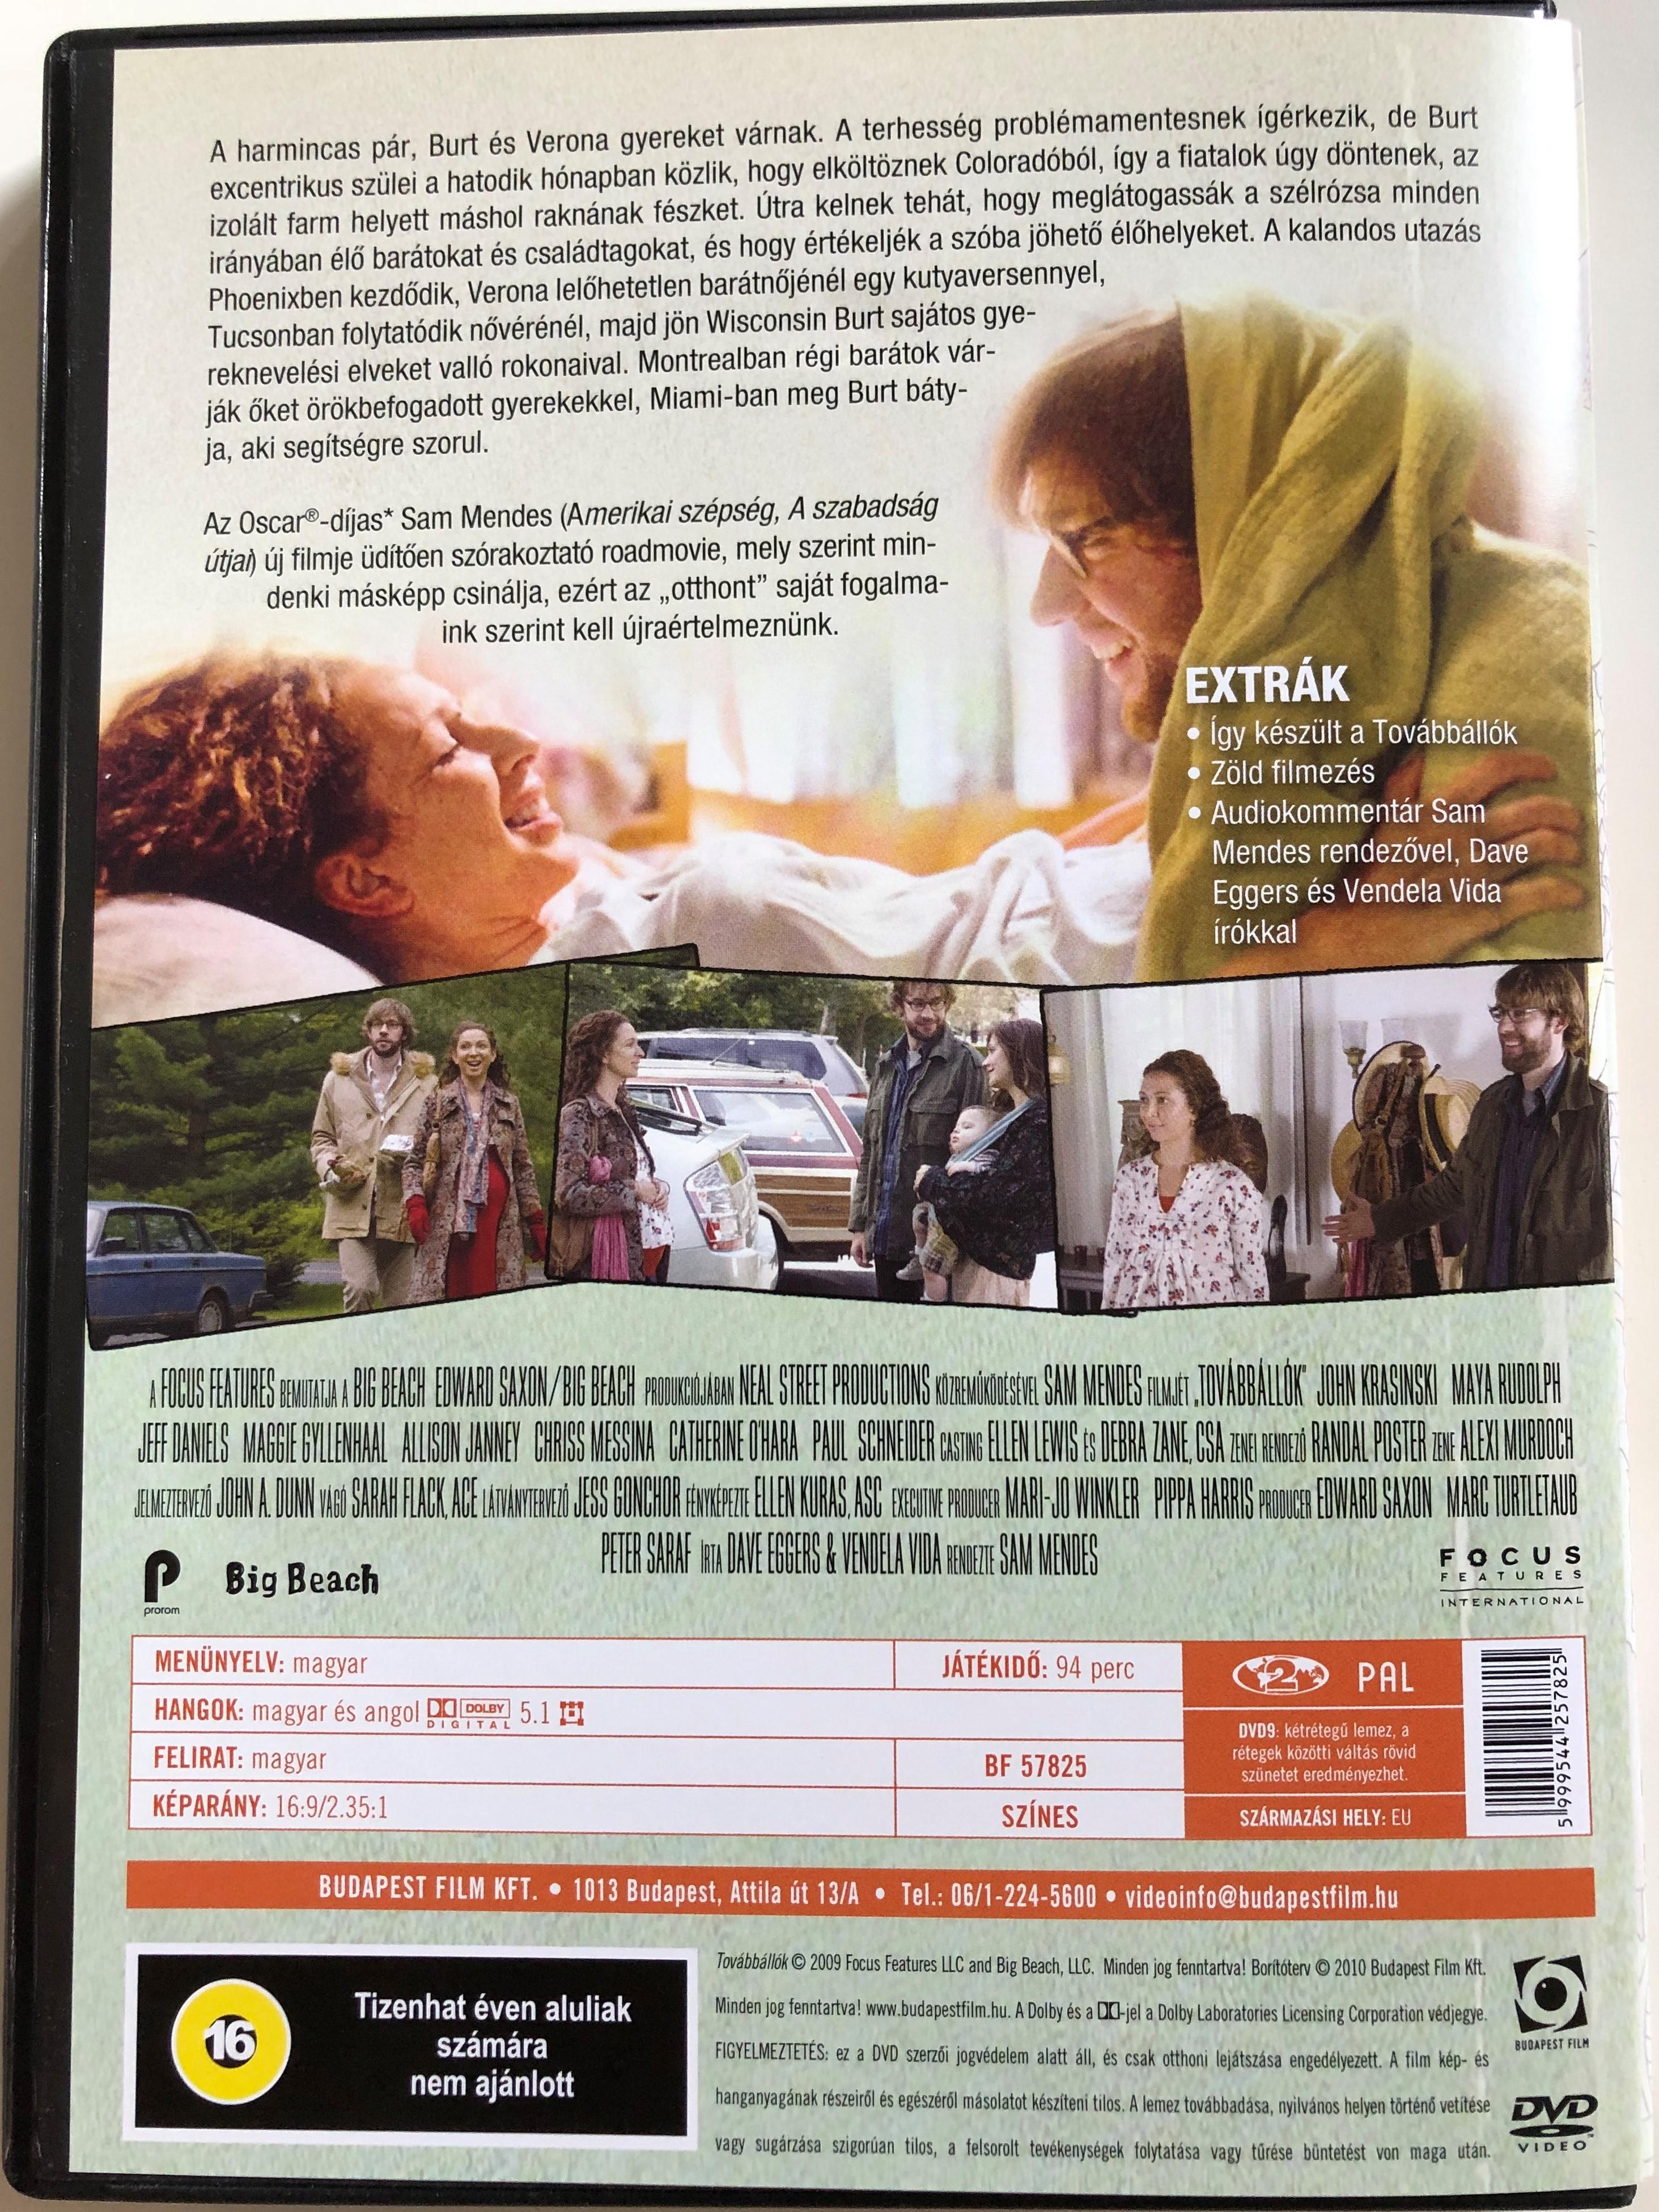 away-we-go-dvd-2009-tov-bb-ll-k-directed-by-sam-mendes-2.jpg